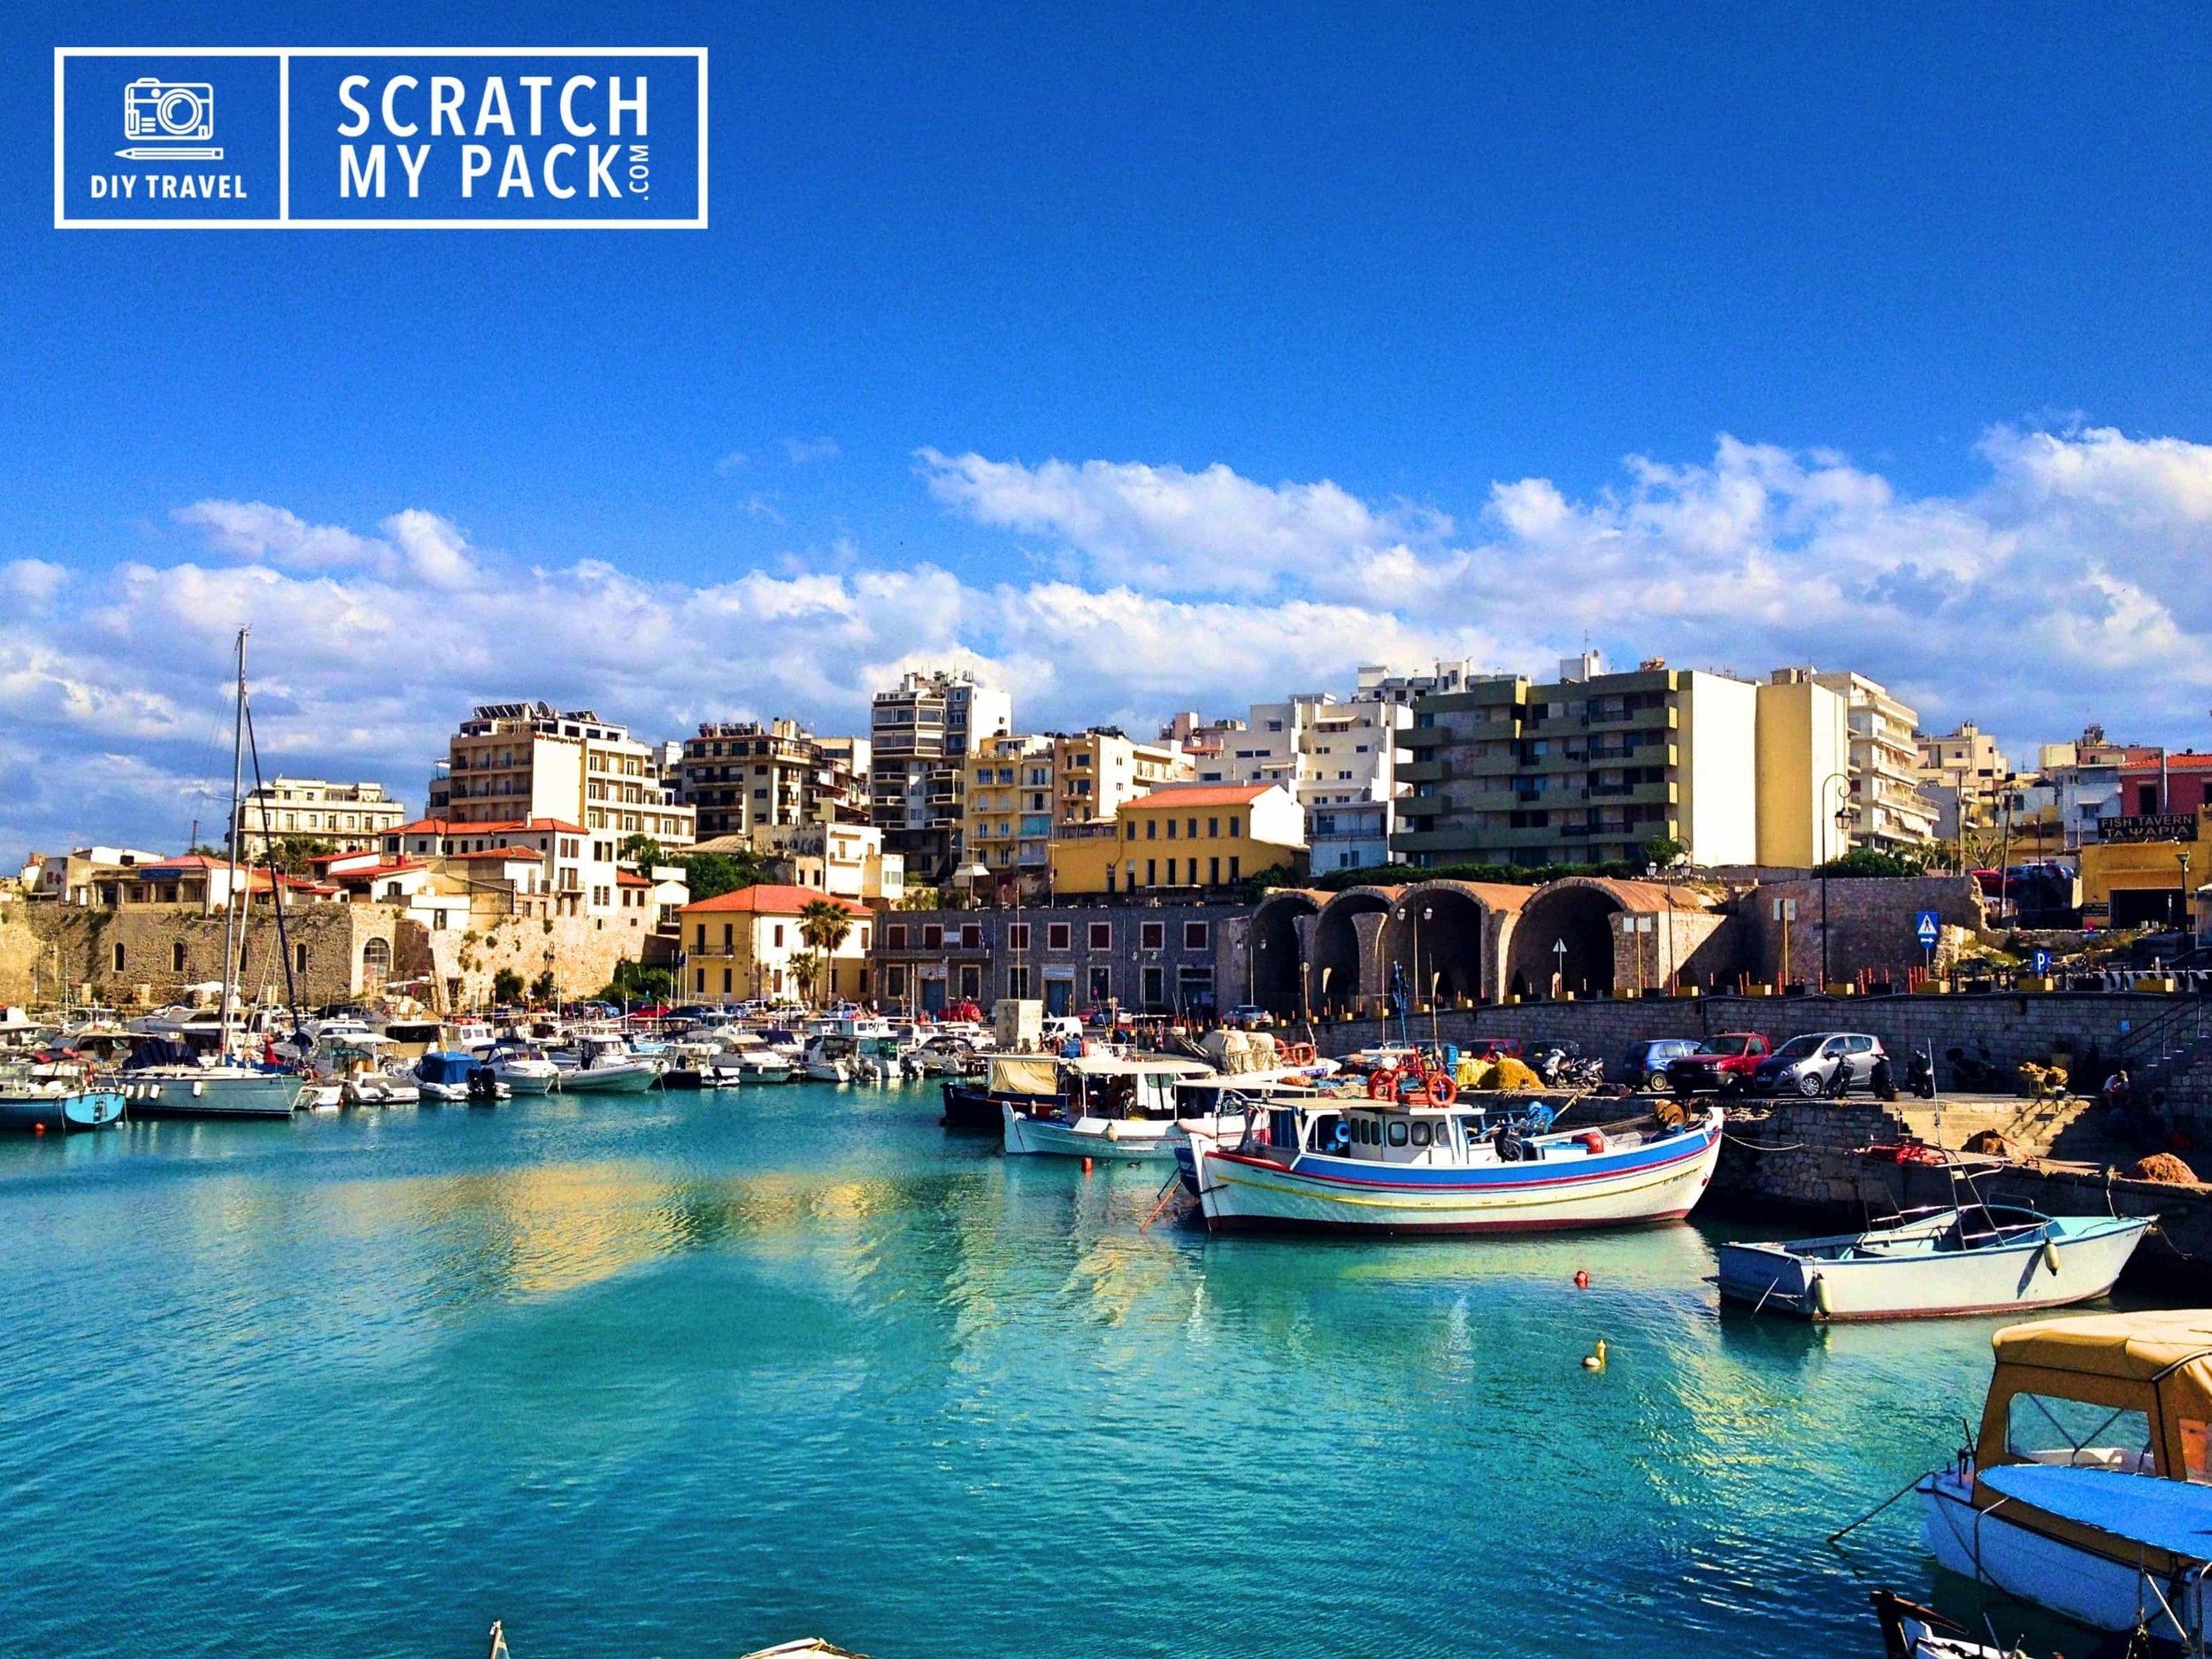 The Old Port of Heraklion, Crete